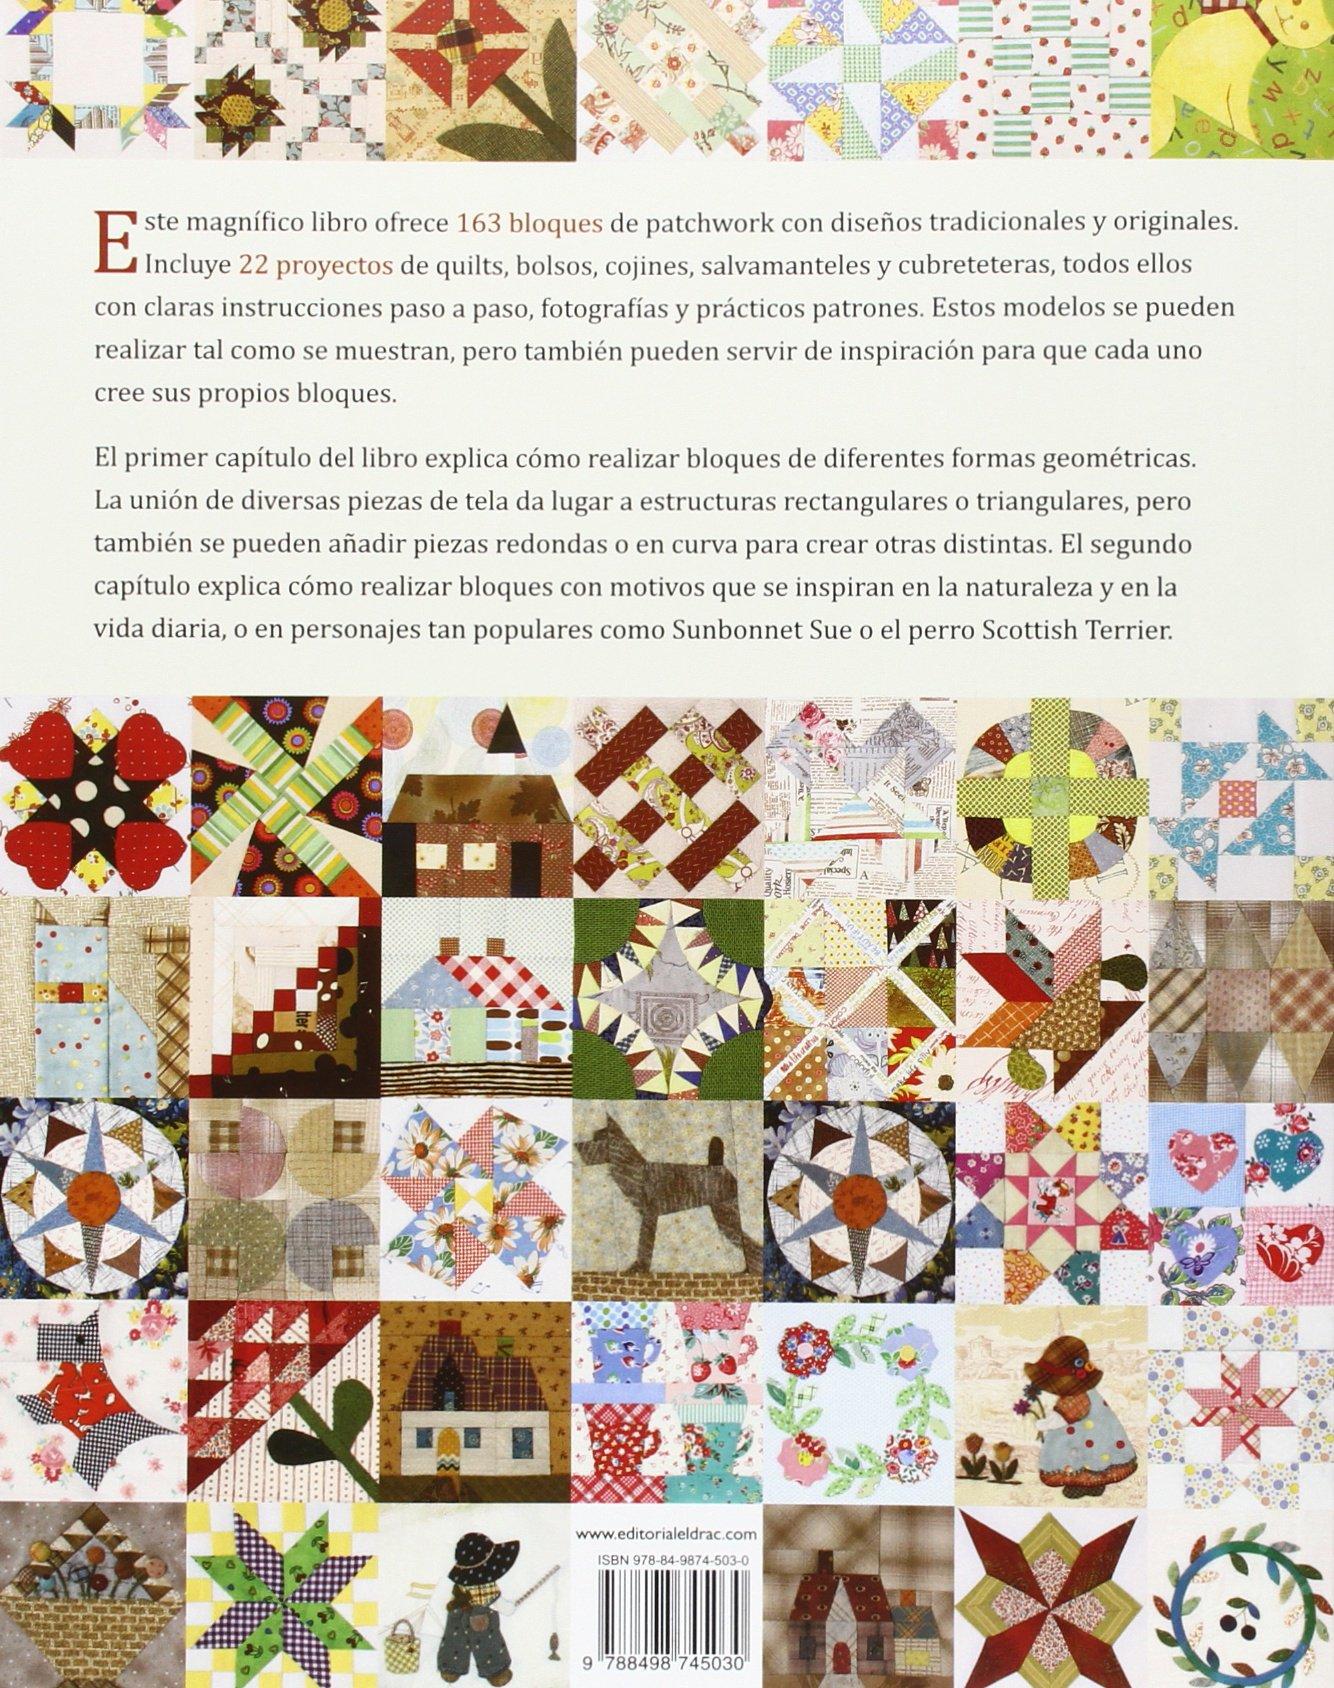 163 Bloques De Patchwork: Amazon.es: Laia Jordana Altés, Ana María ...